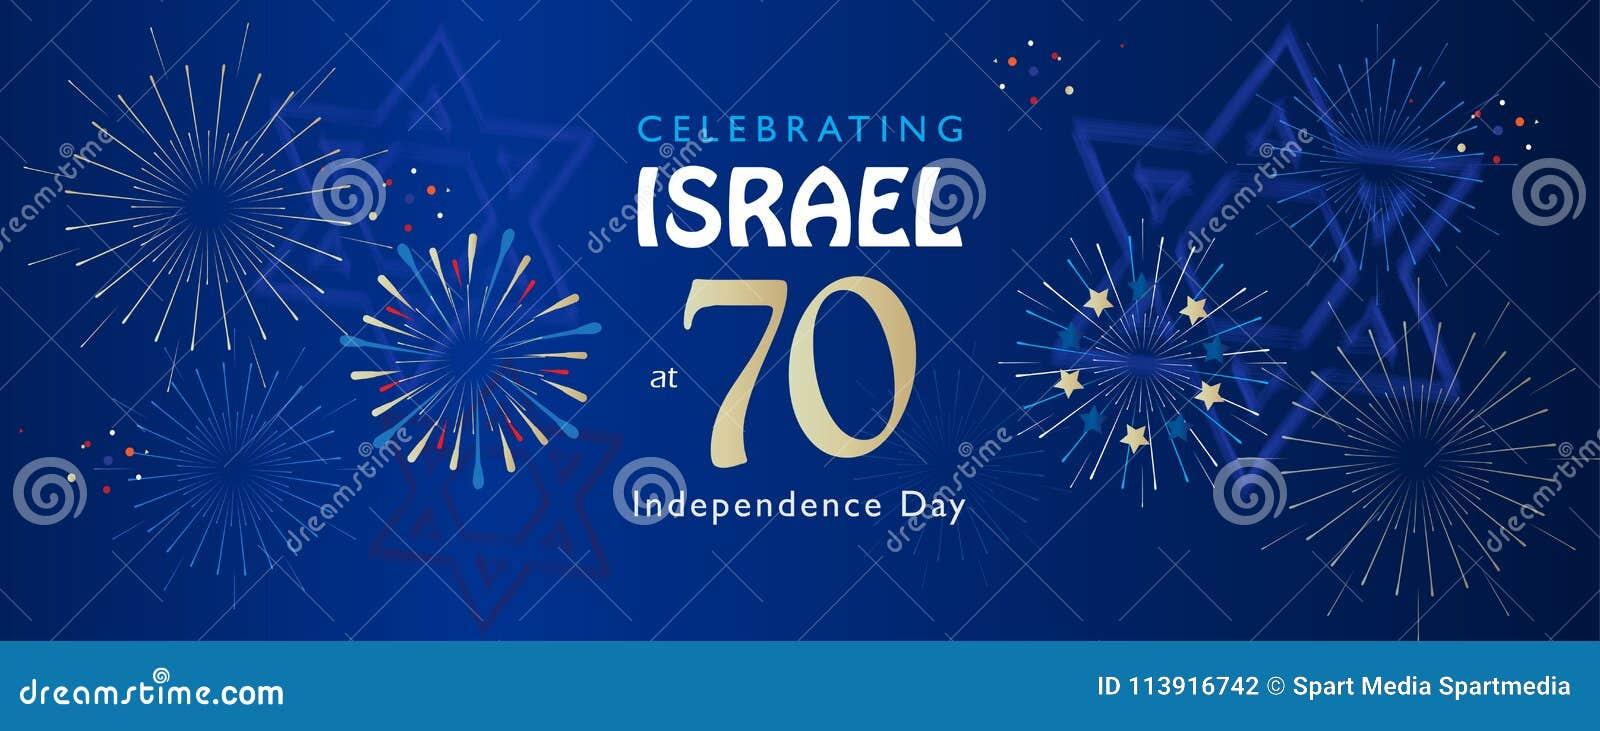 Jahrestag Israels 70, Unabhängigkeitstag